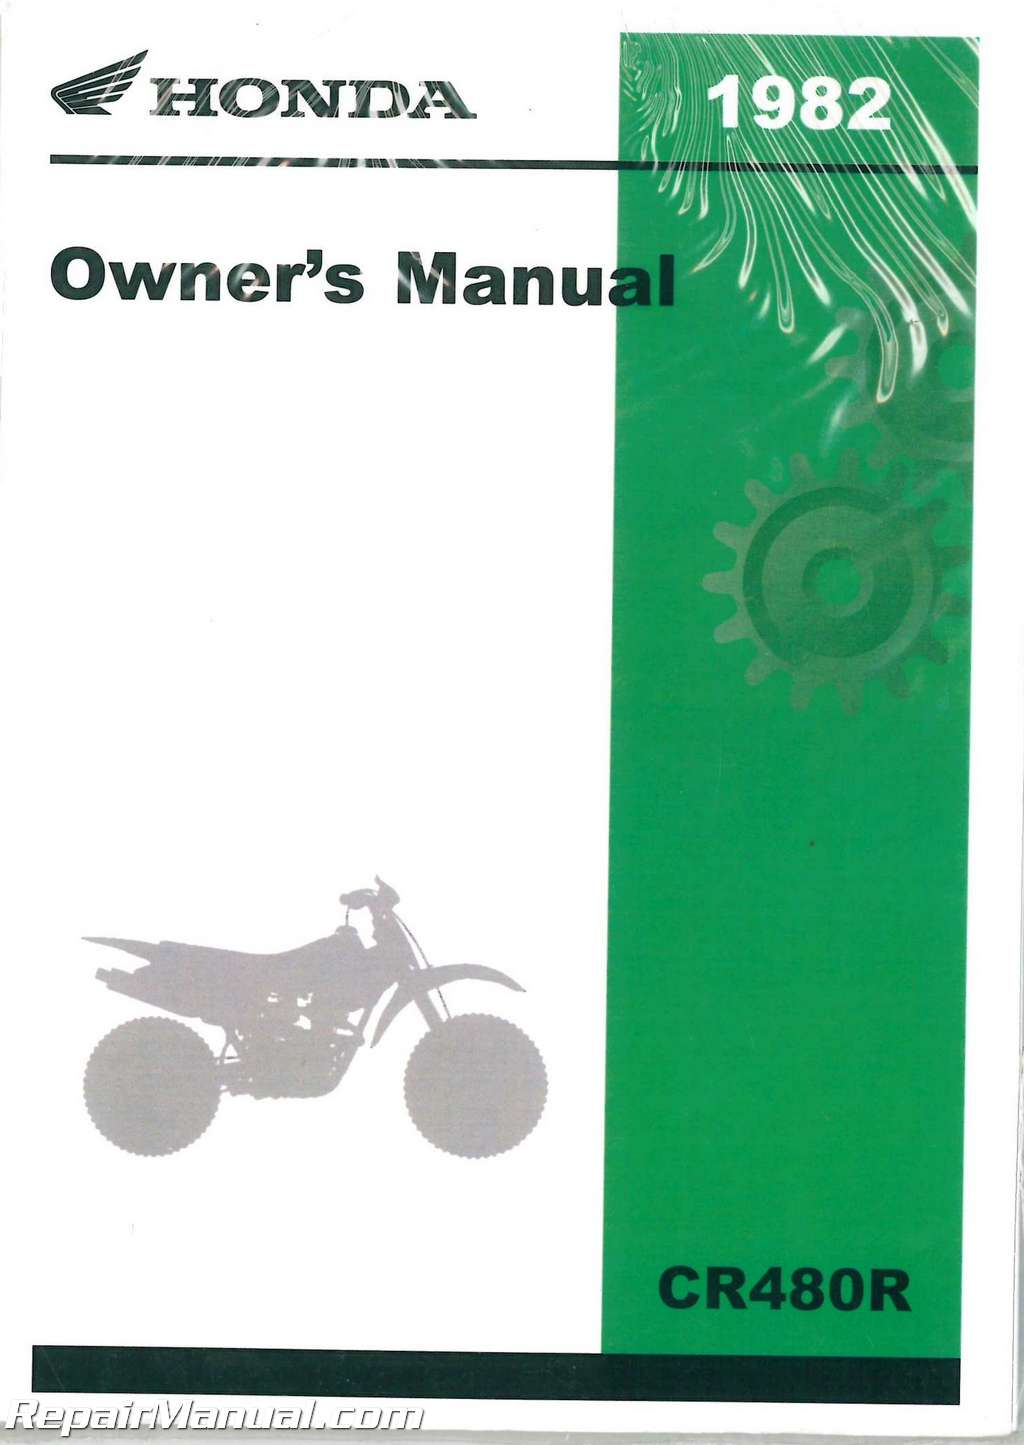 1982 Honda Cr480r Motorcycle Owners Manual   31ka510